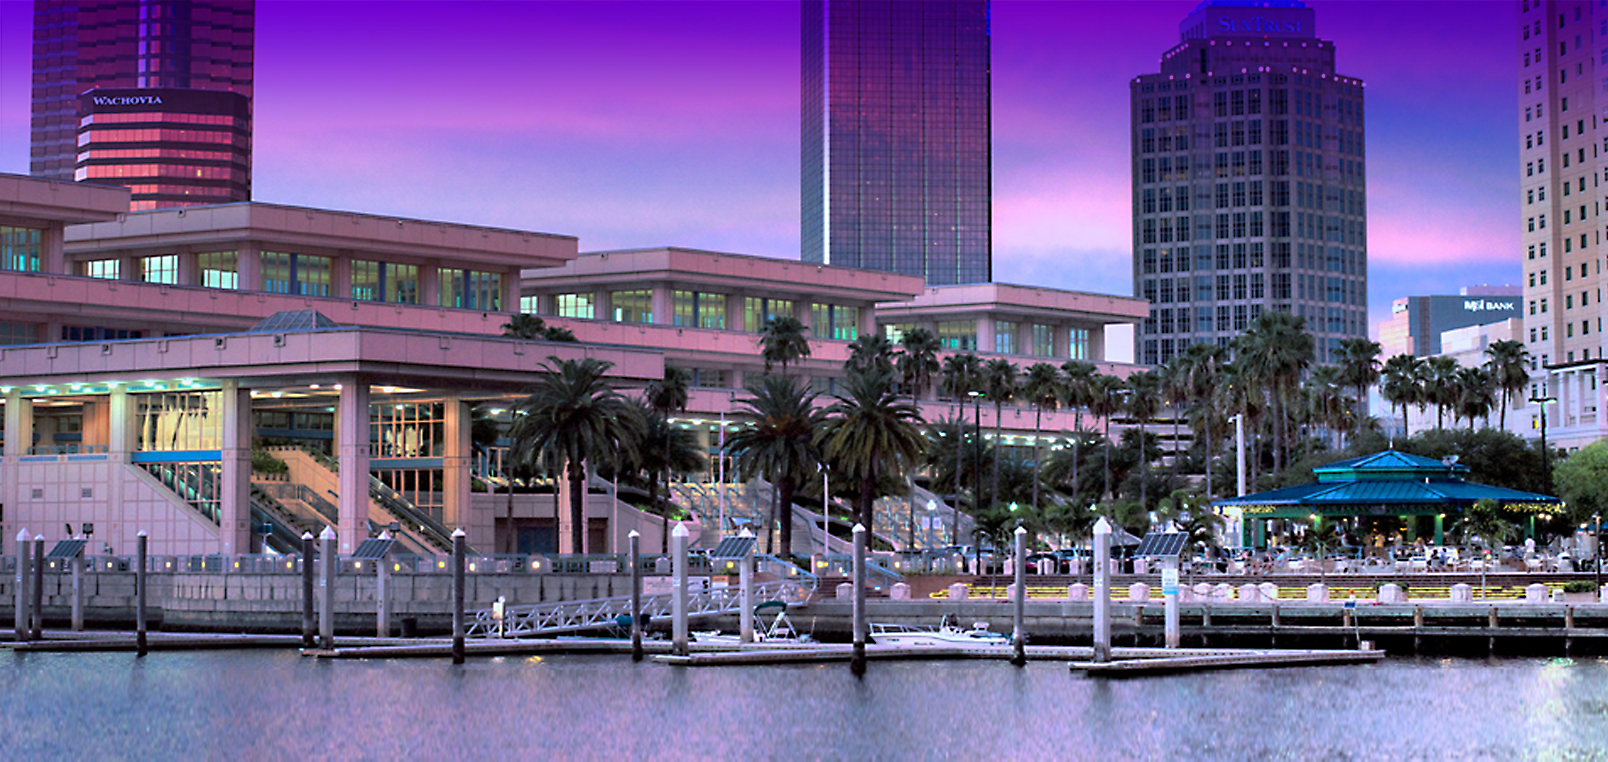 Tampa_Header_1600x